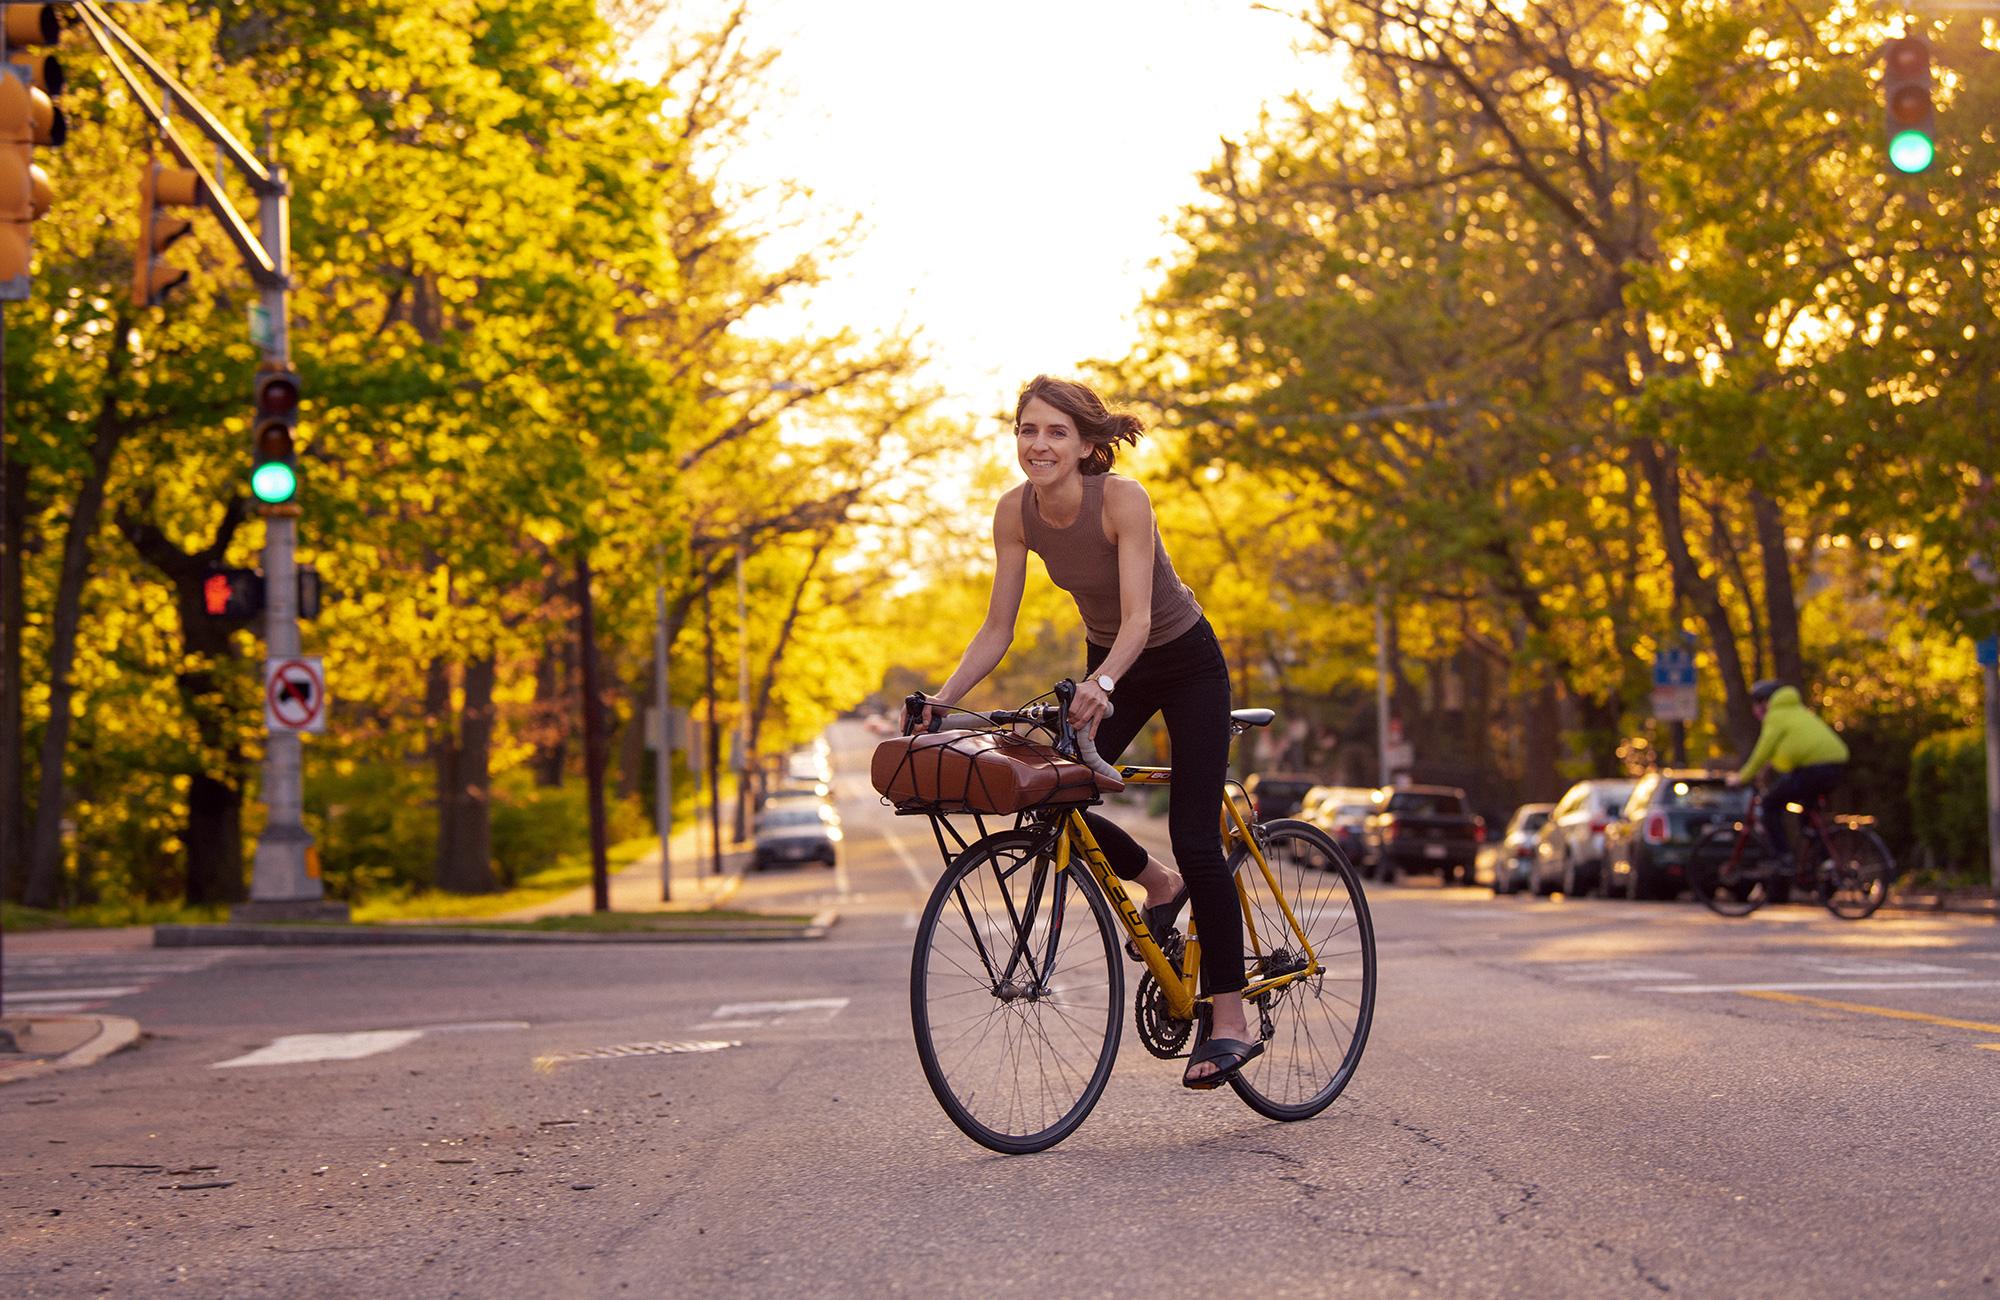 Lisa Piccirillo on a bicylcle